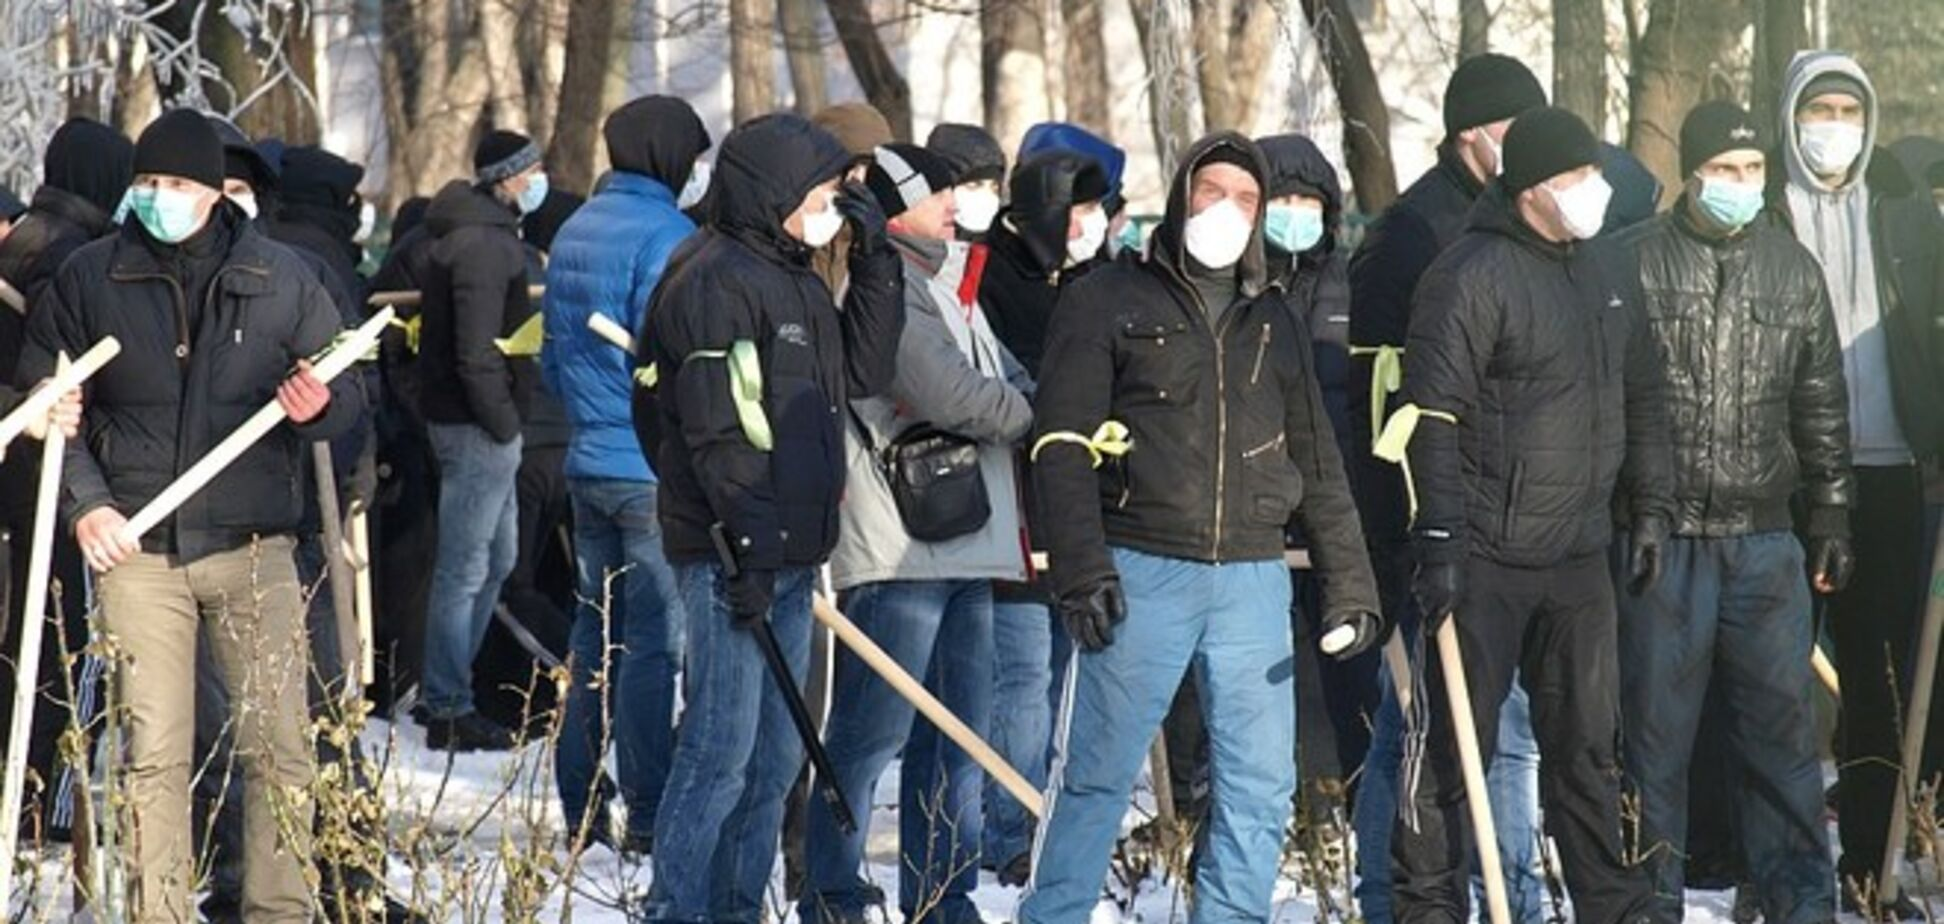 ГПУ раскрыла убийство журналиста 'Вестей' Вячеслава Веремия